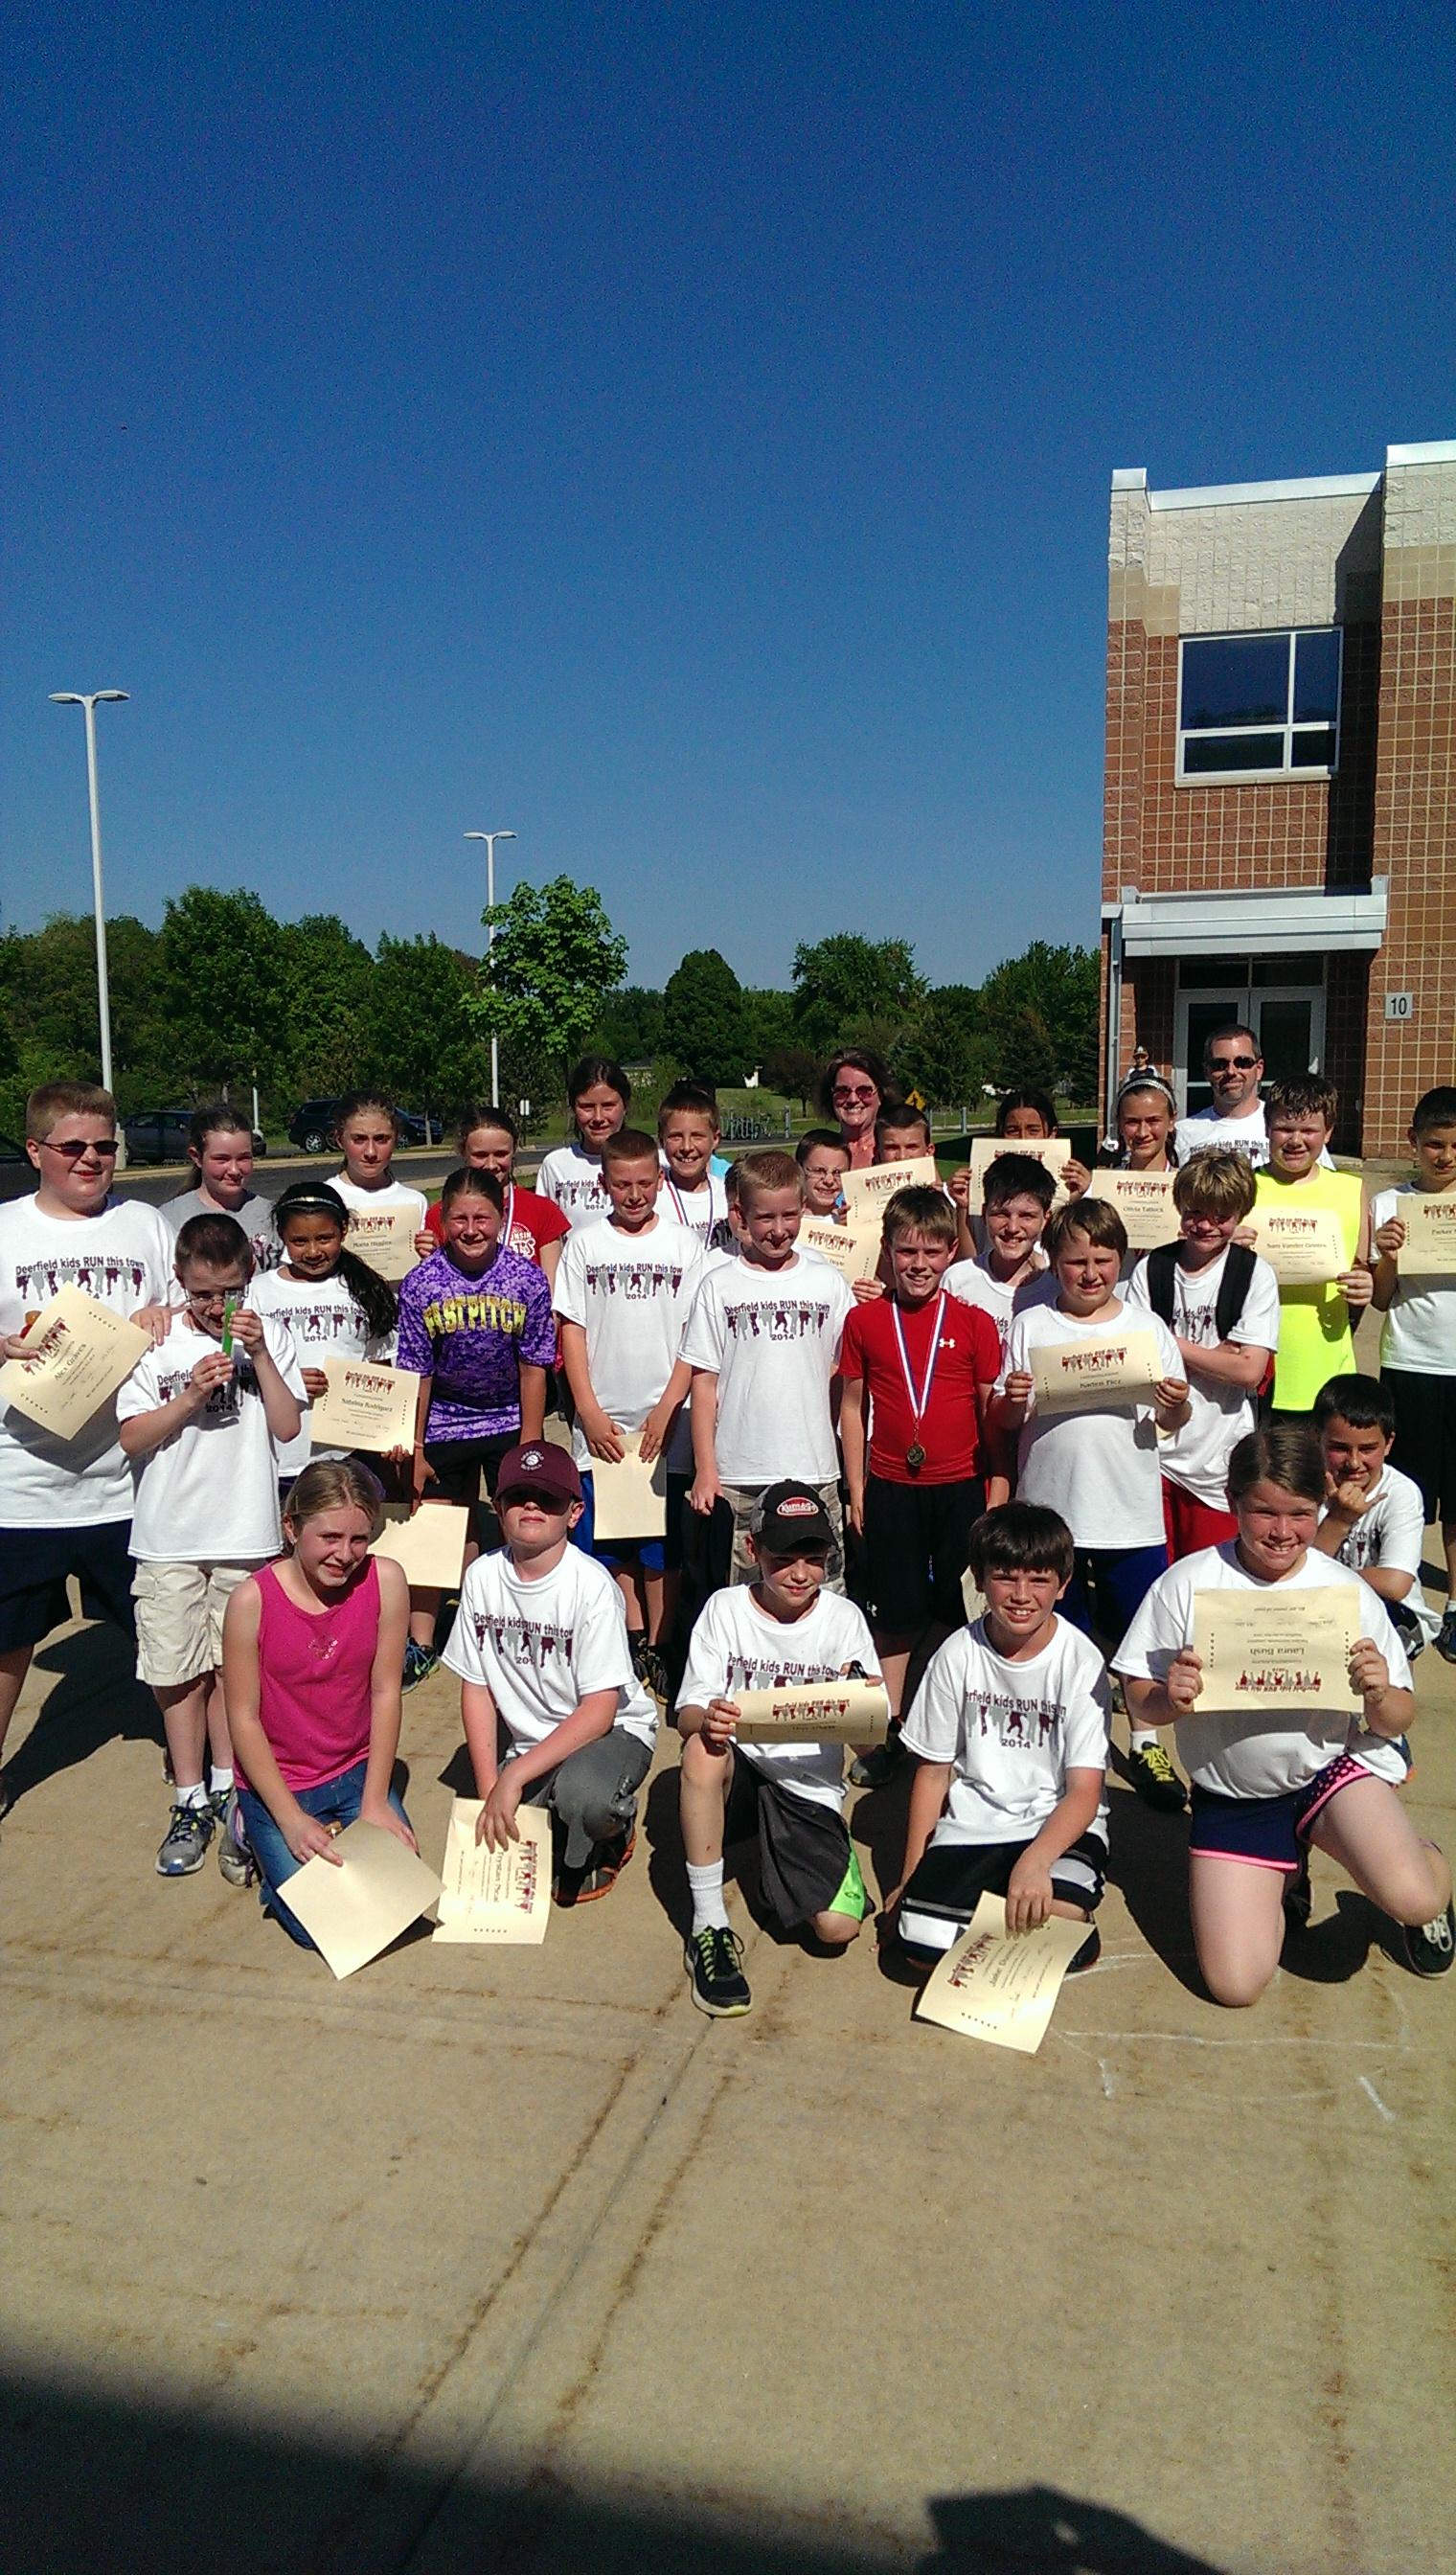 Deerfield on the run. After school running club grades 4 through 6.